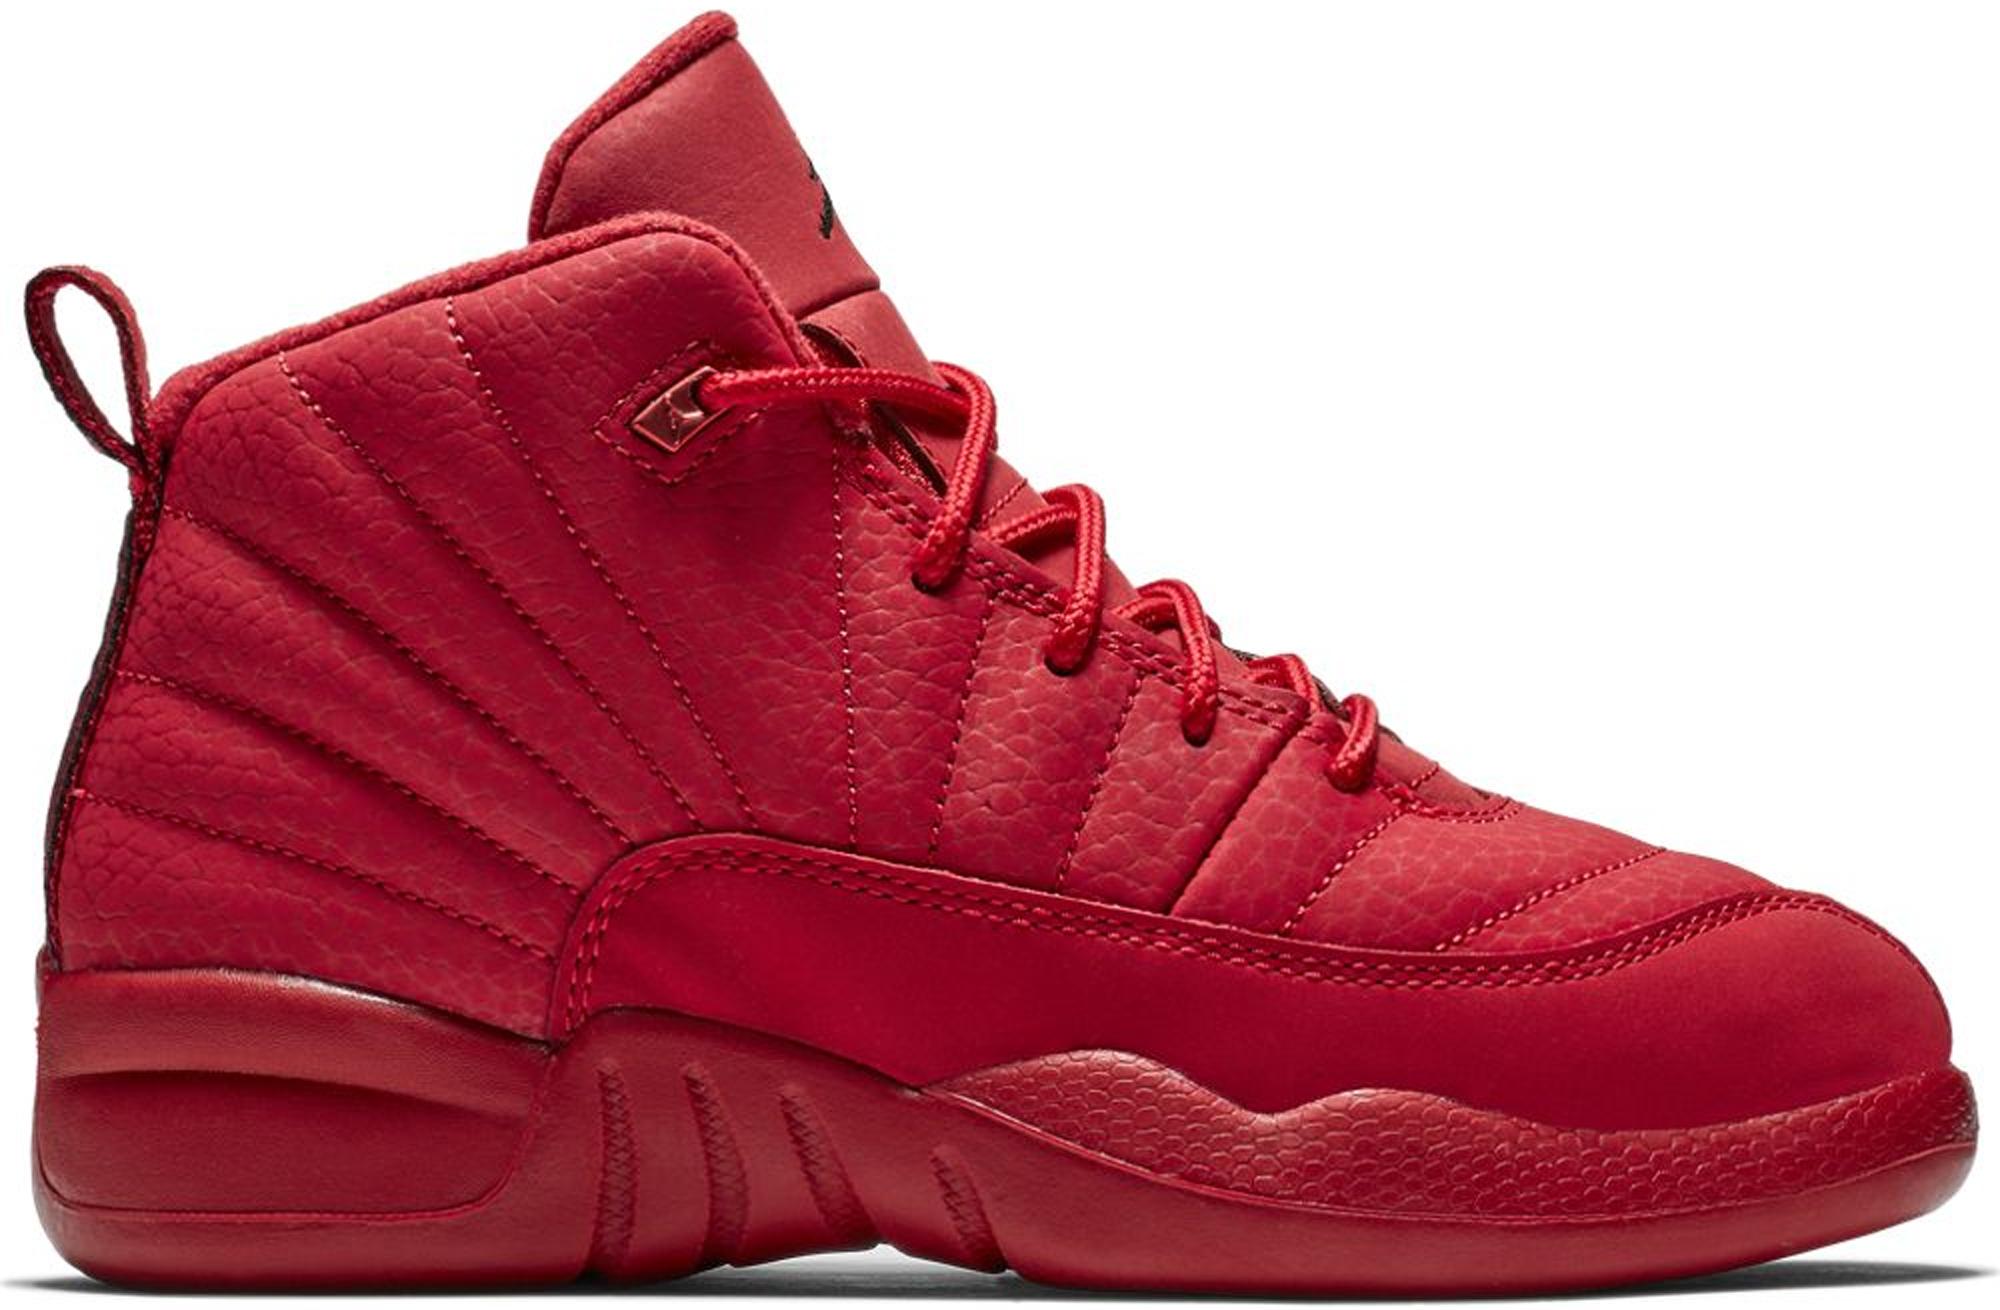 Jordan 12 Retro Gym Red 2018 (PS)